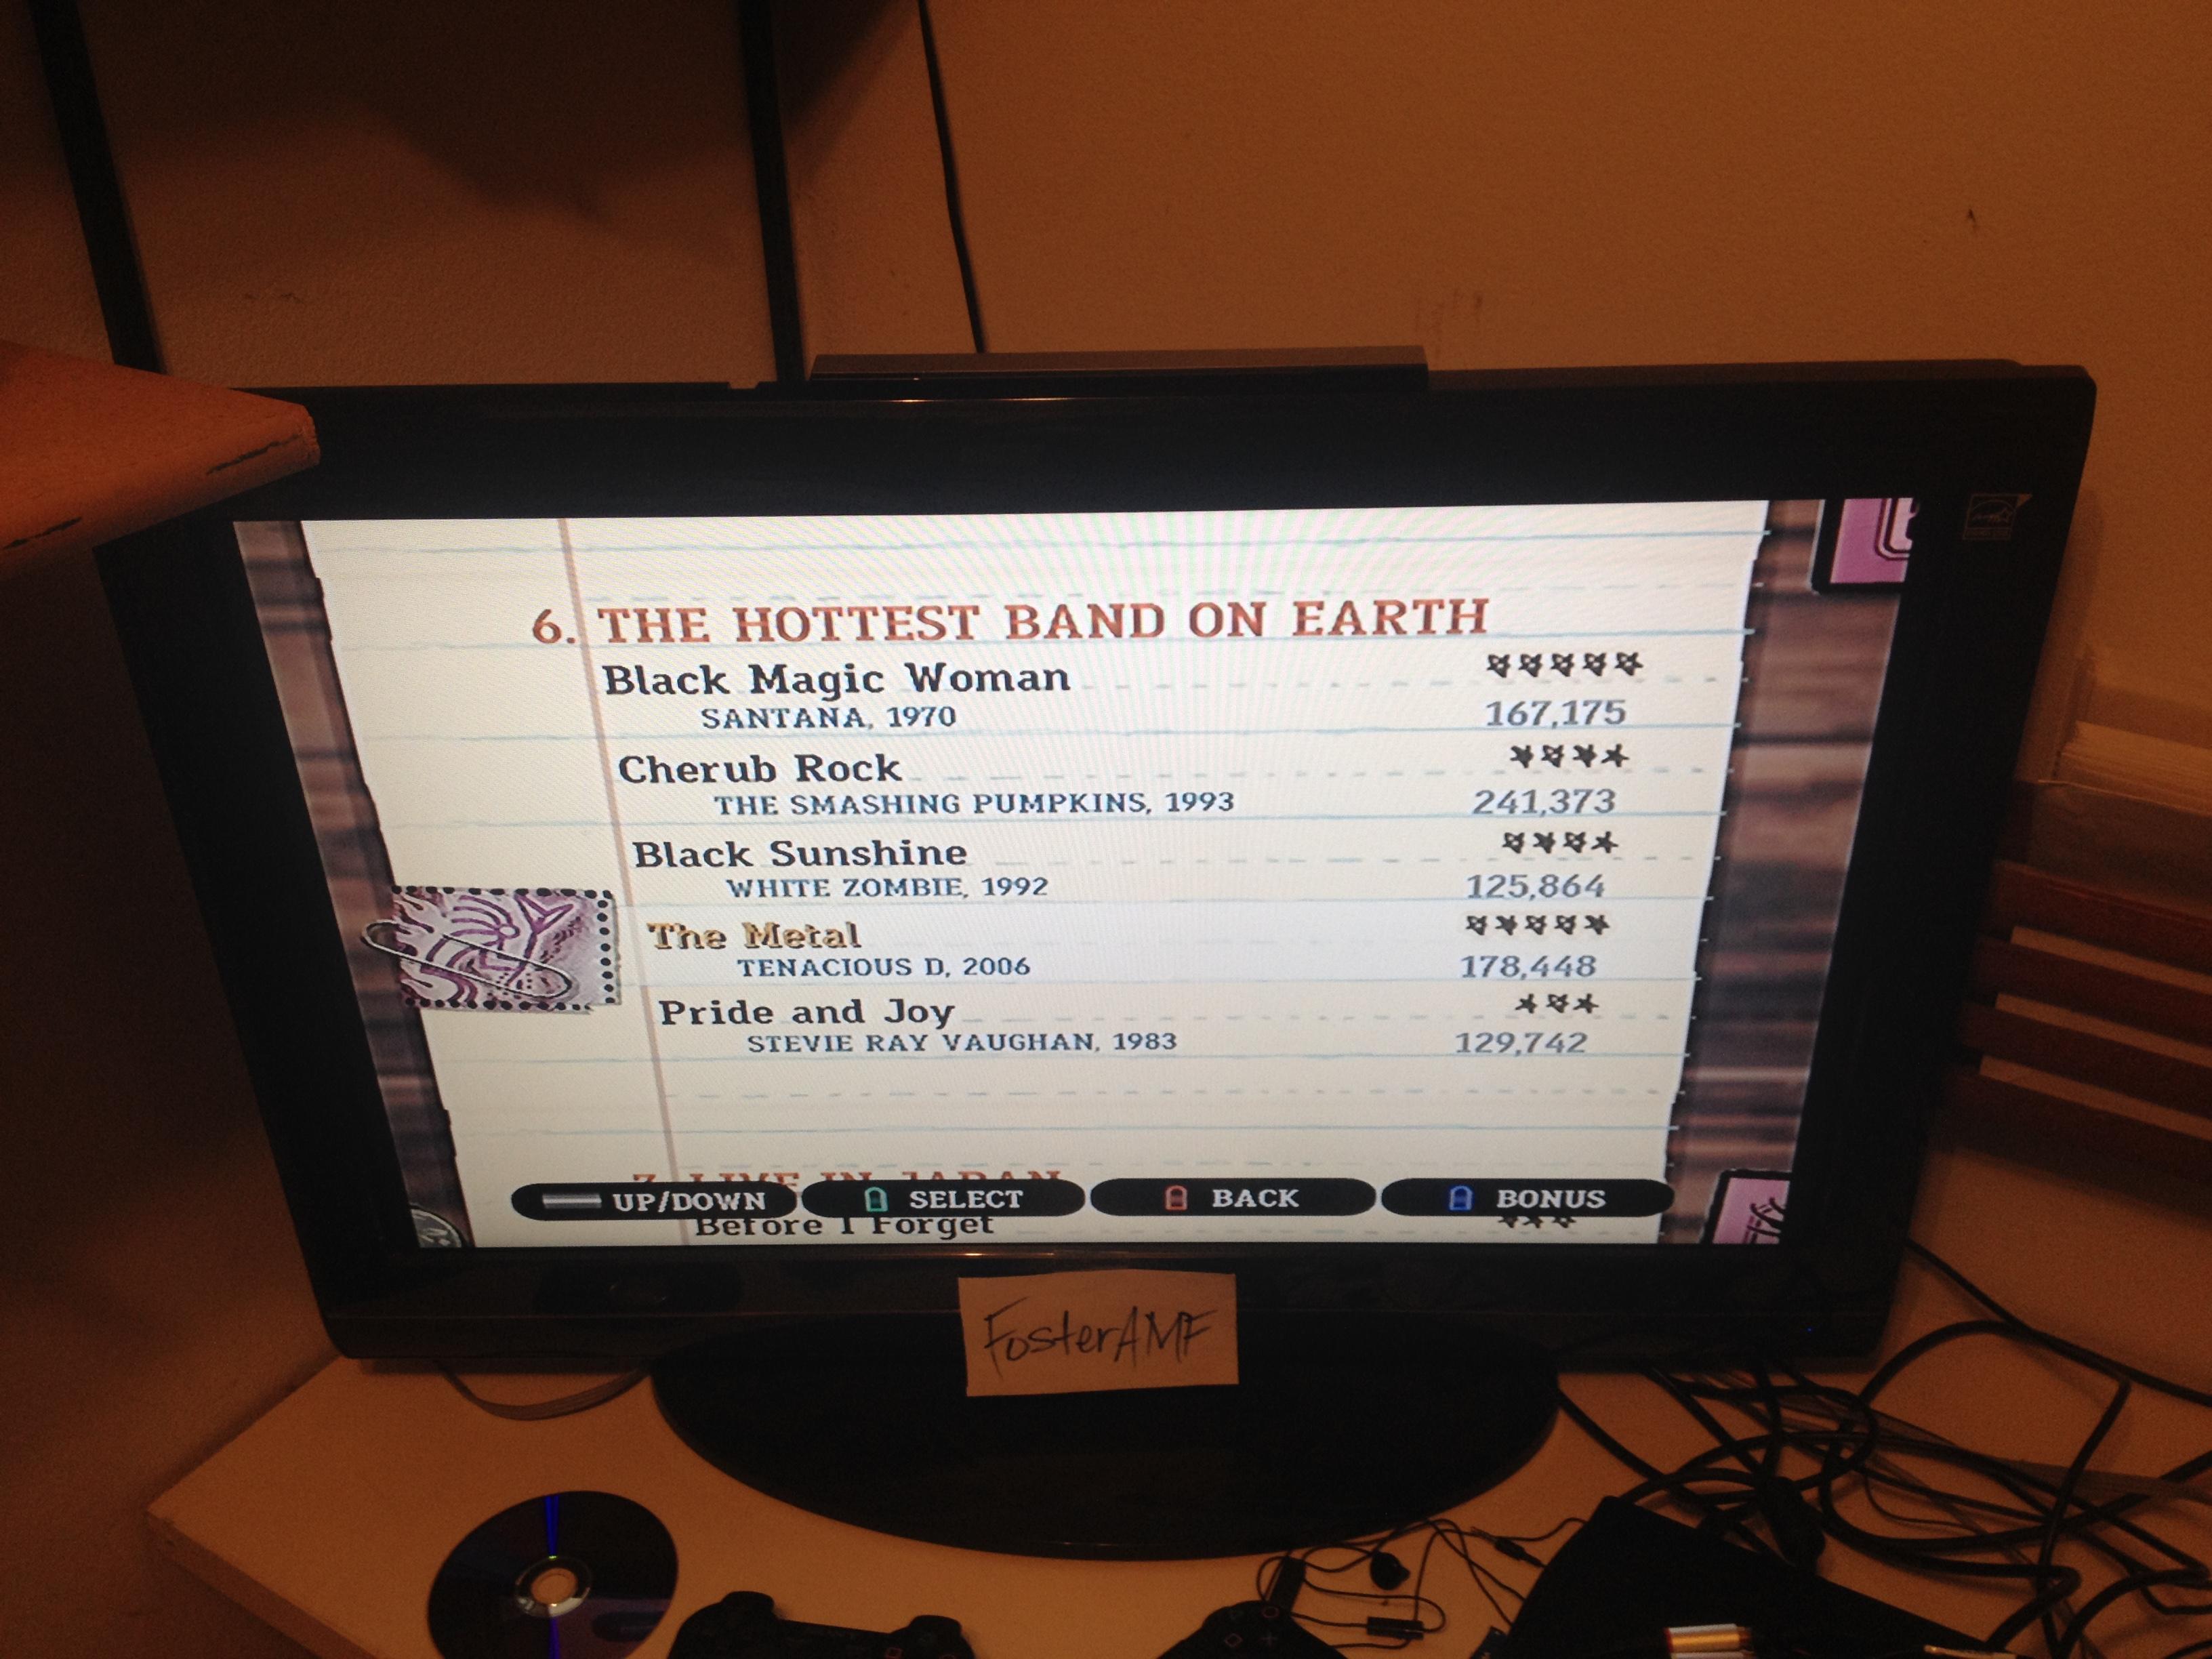 "FosterAMF: Guitar Hero III: Legends of Rock: ""Black Magic Woman"" [Expert] (Wii) 167,175 points on 2015-04-18 23:17:34"